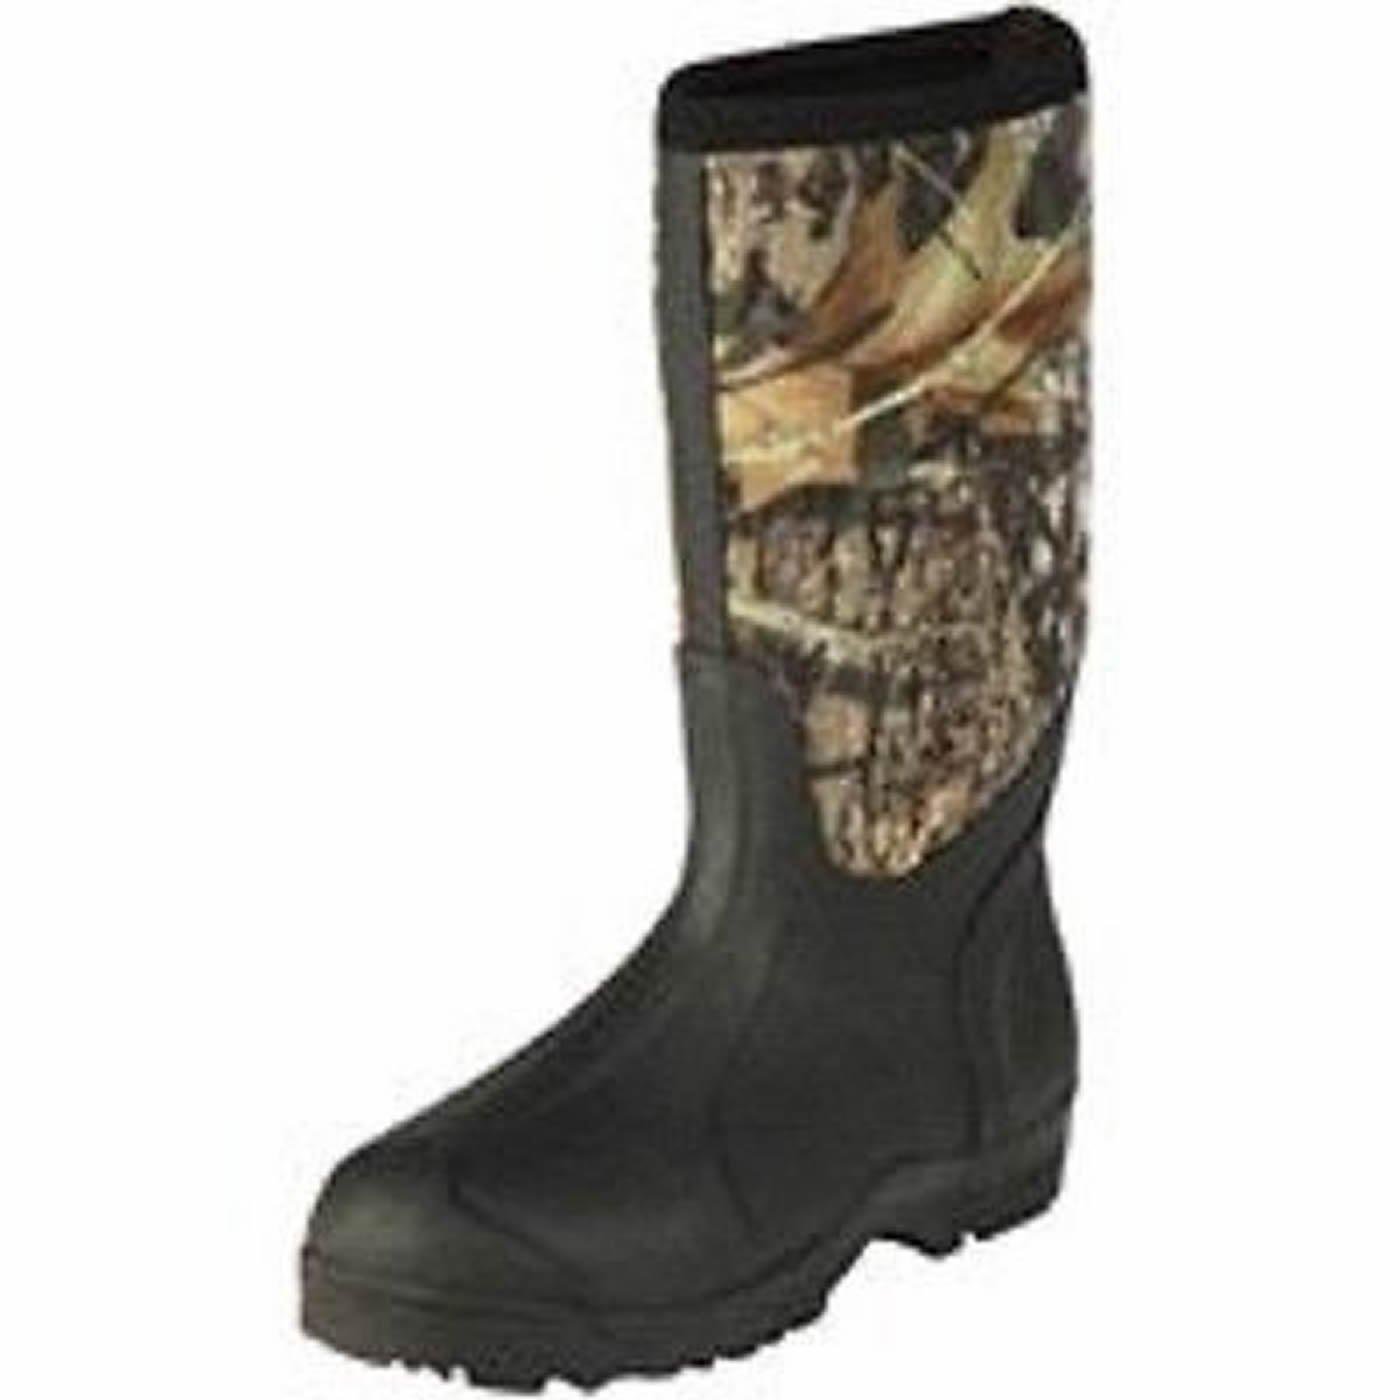 New Norcross 67503 Size 13 Mossy Oak Camo Break Up Sole 15'' Work Hunting Boots